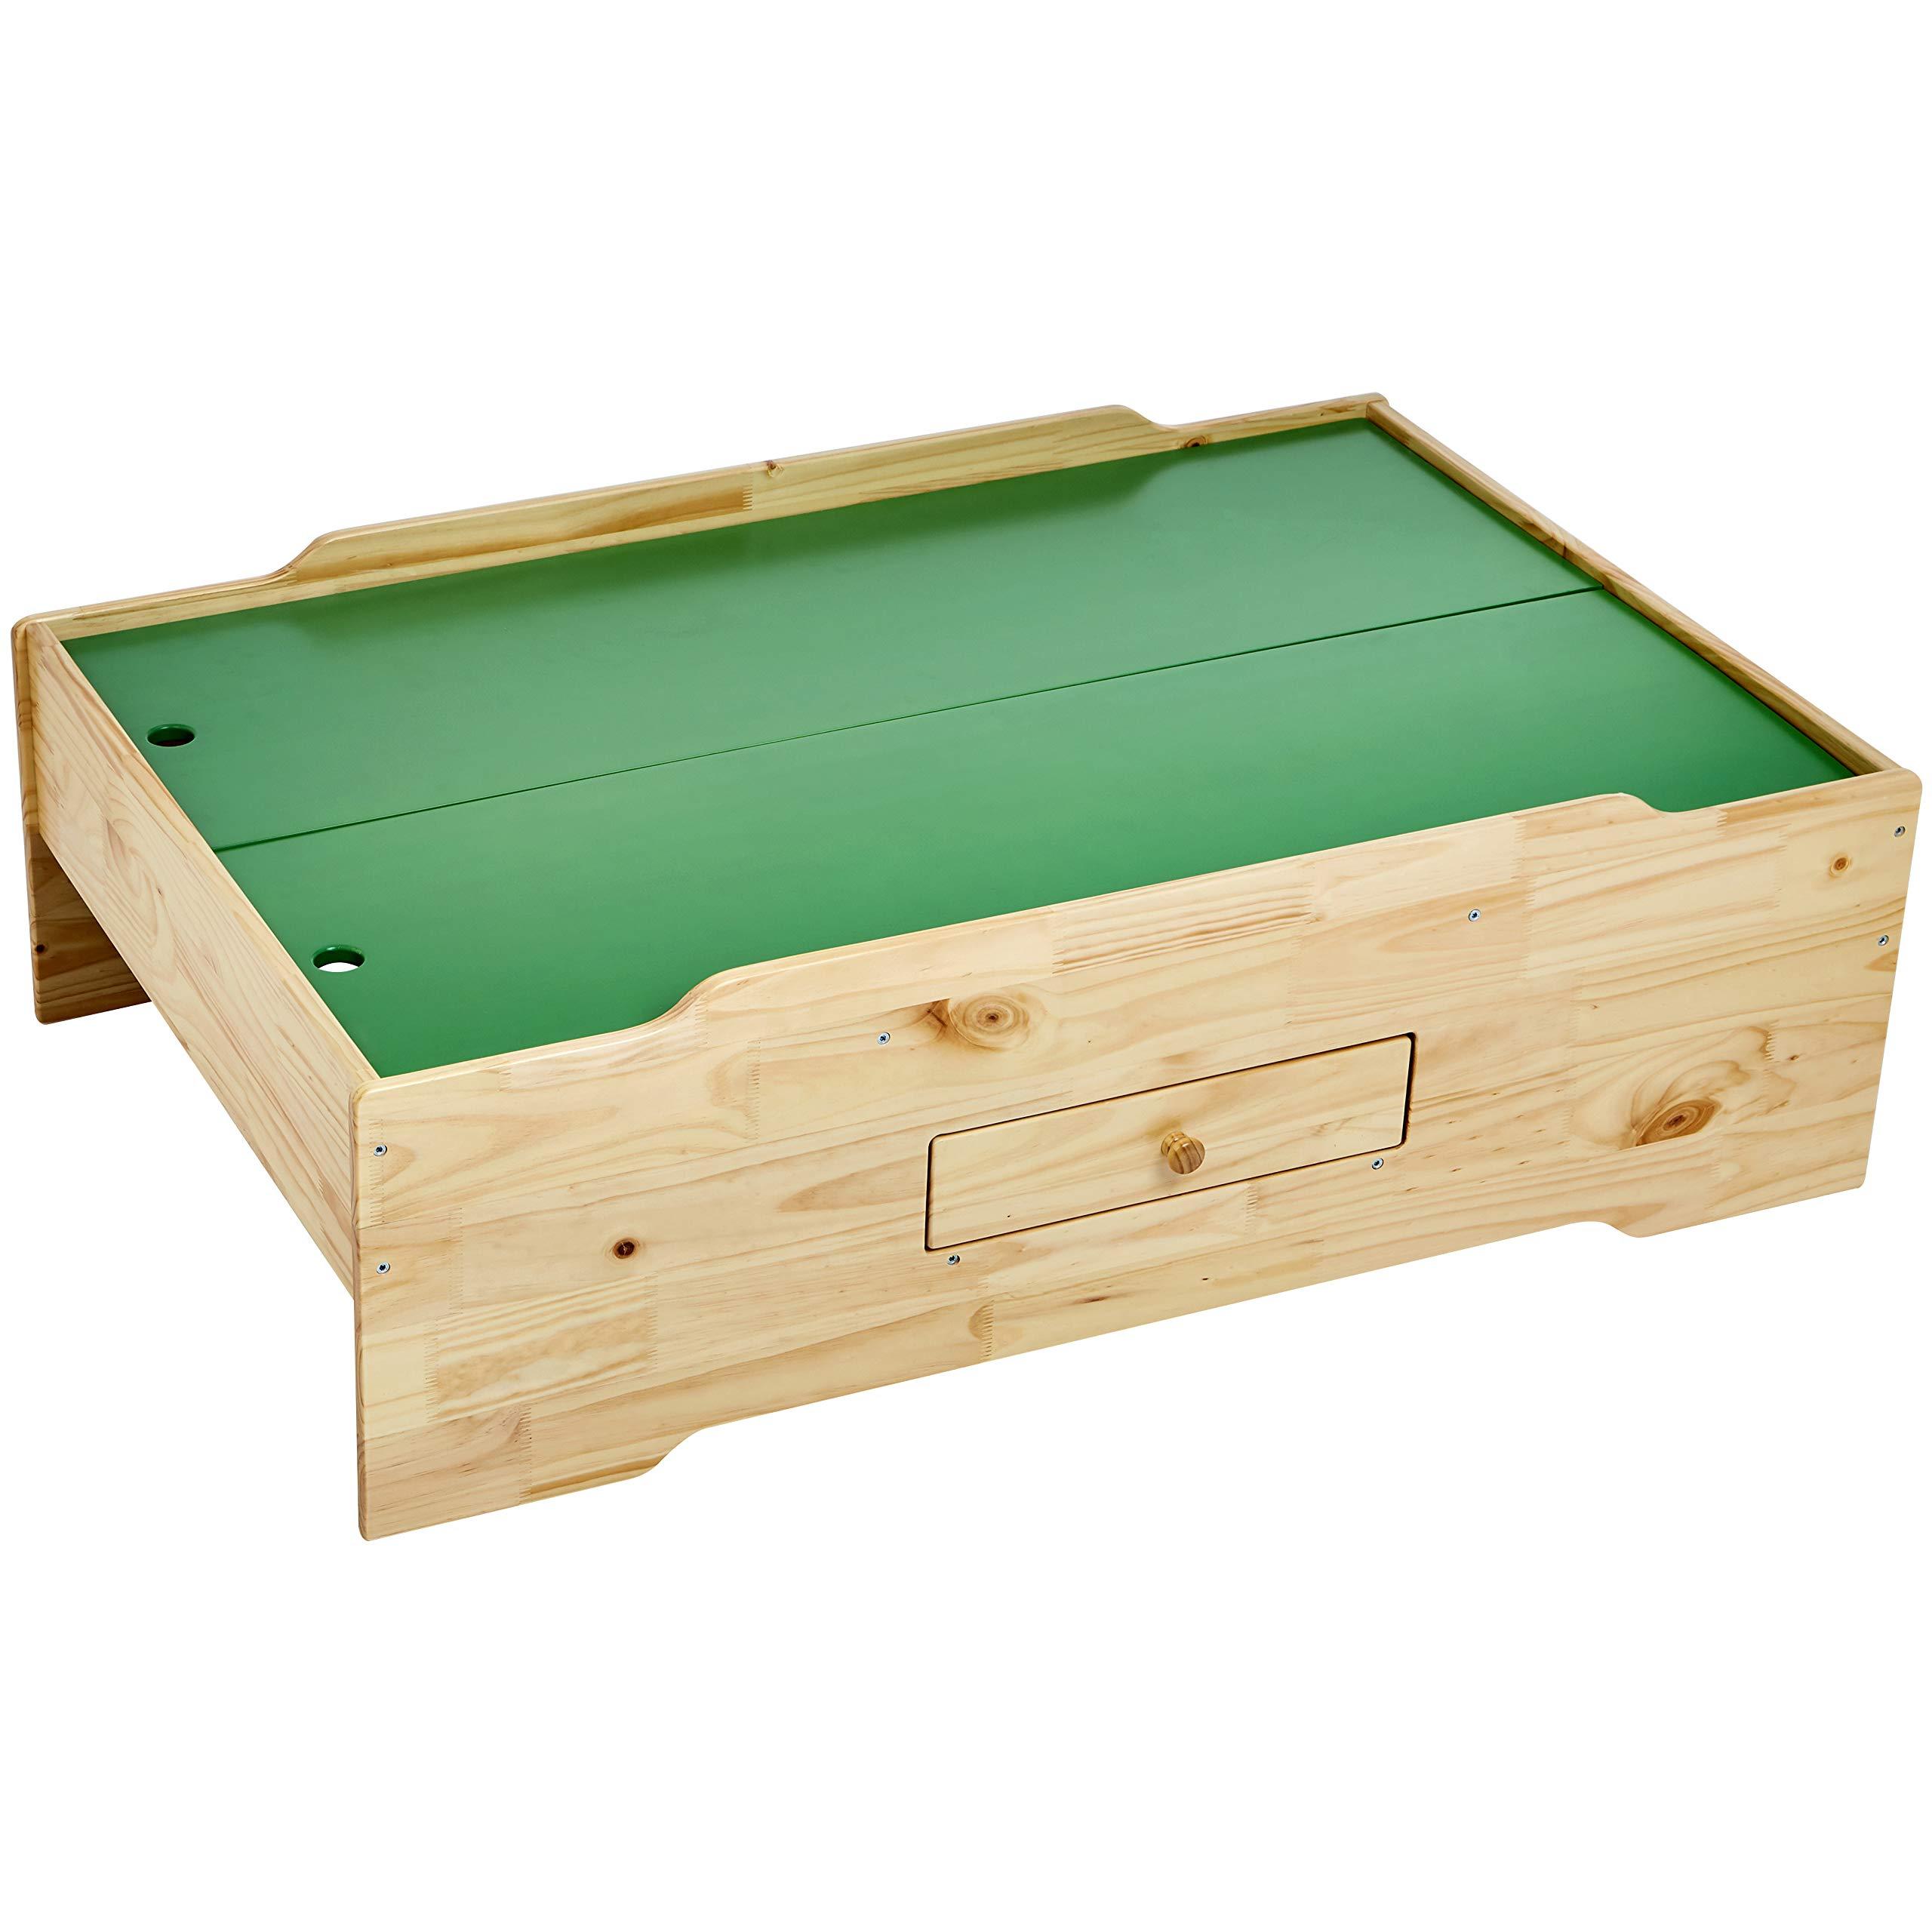 AmazonBasics Wooden Multi-Activity Play Table, Natural